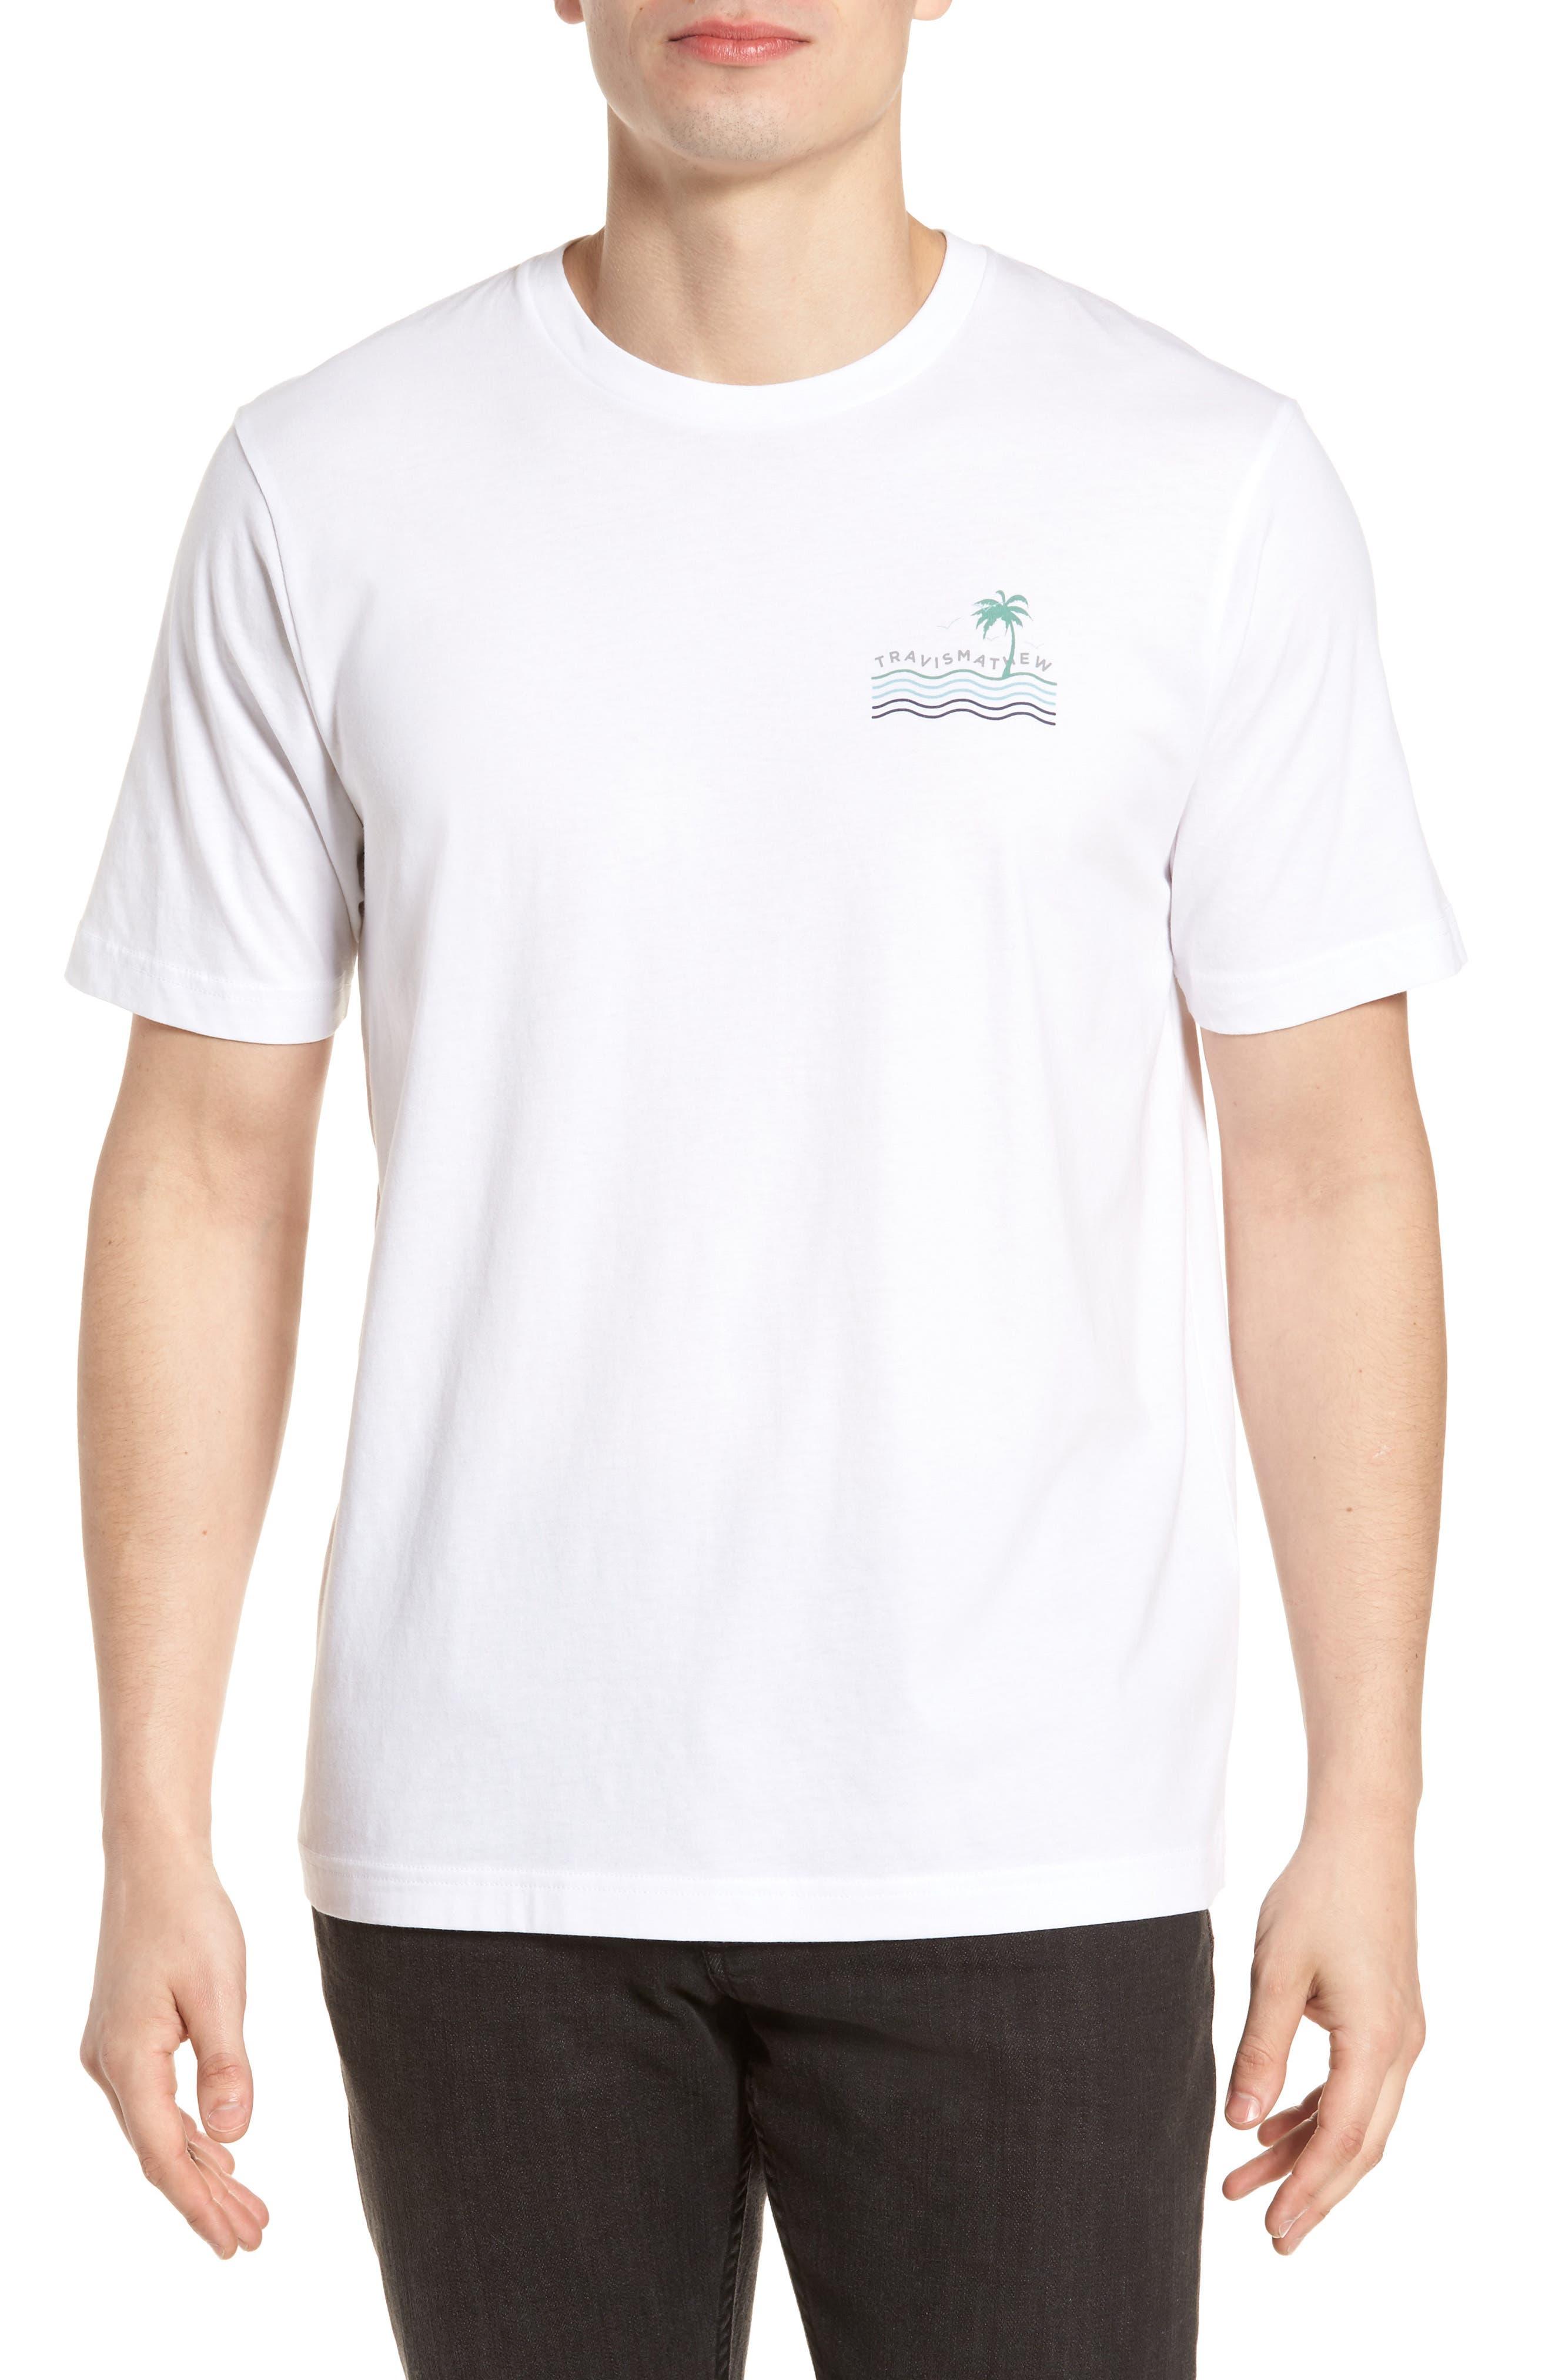 Alternate Image 1 Selected - Travis Mathew Double Take Graphic T-Shirt